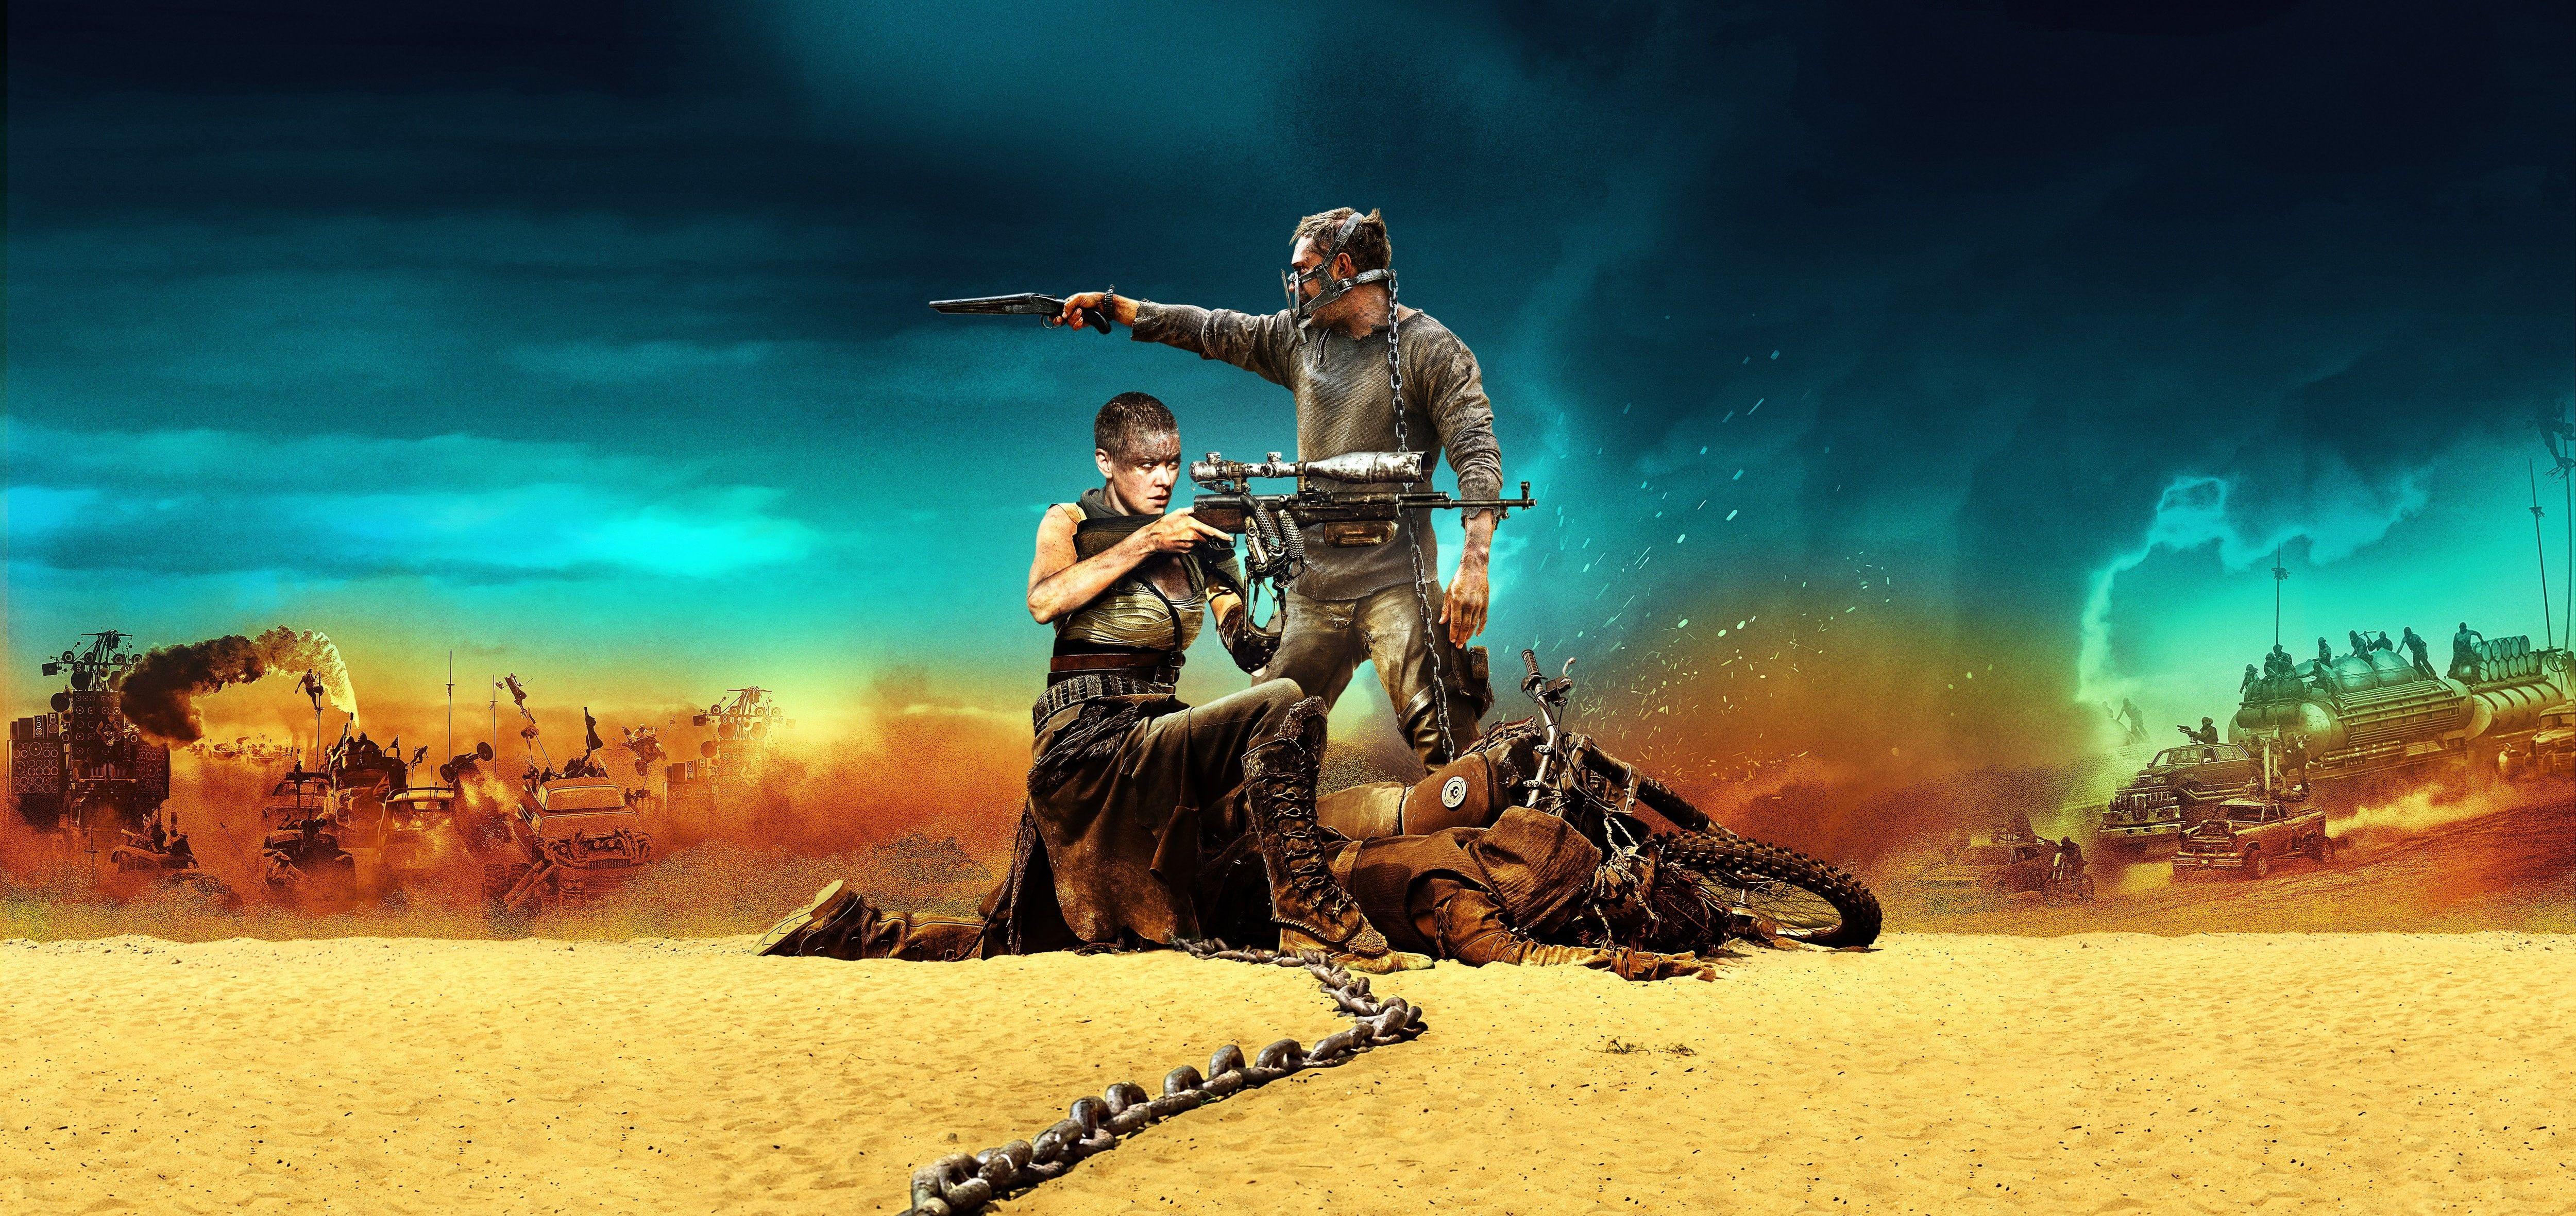 Mad Max Imperator Furiosa Fury Road #Max #4K #wallpaper # ...